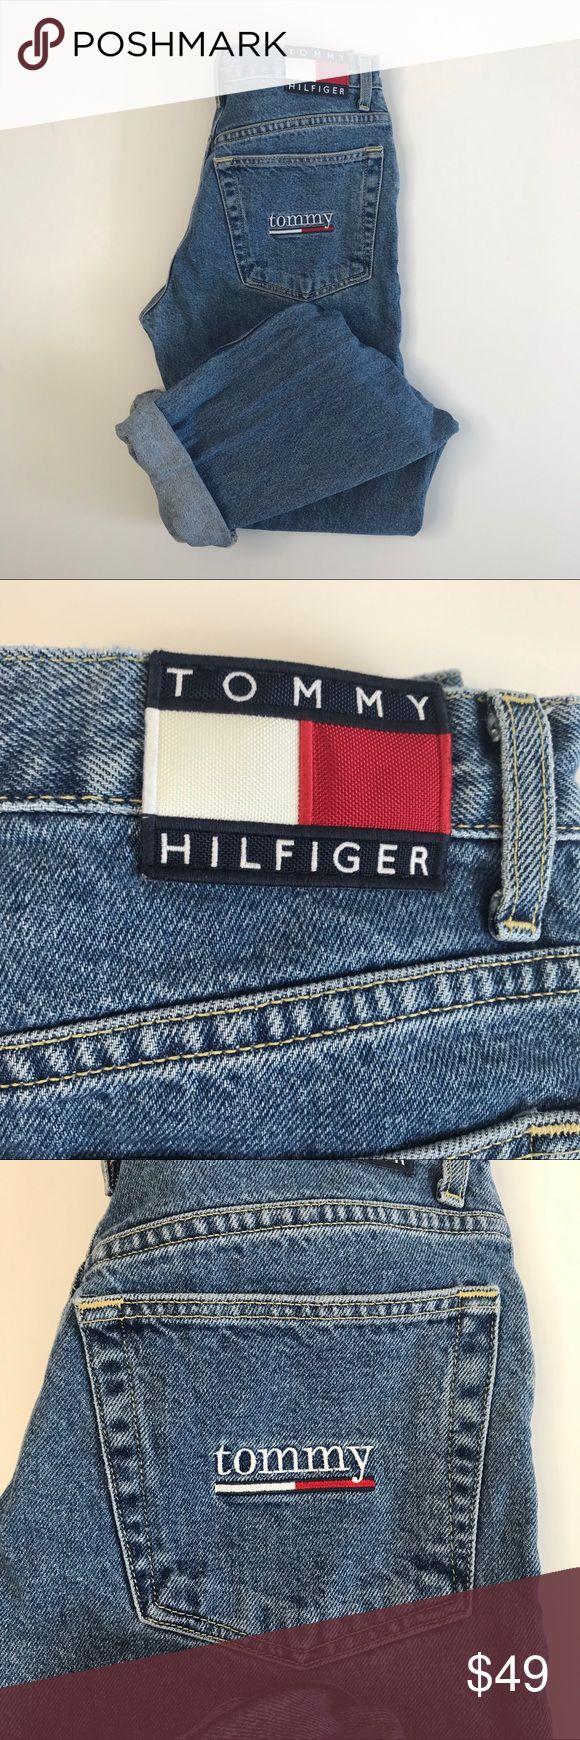 Tommy Hilfiger Mom high waisted jeans Sz 5 The Original